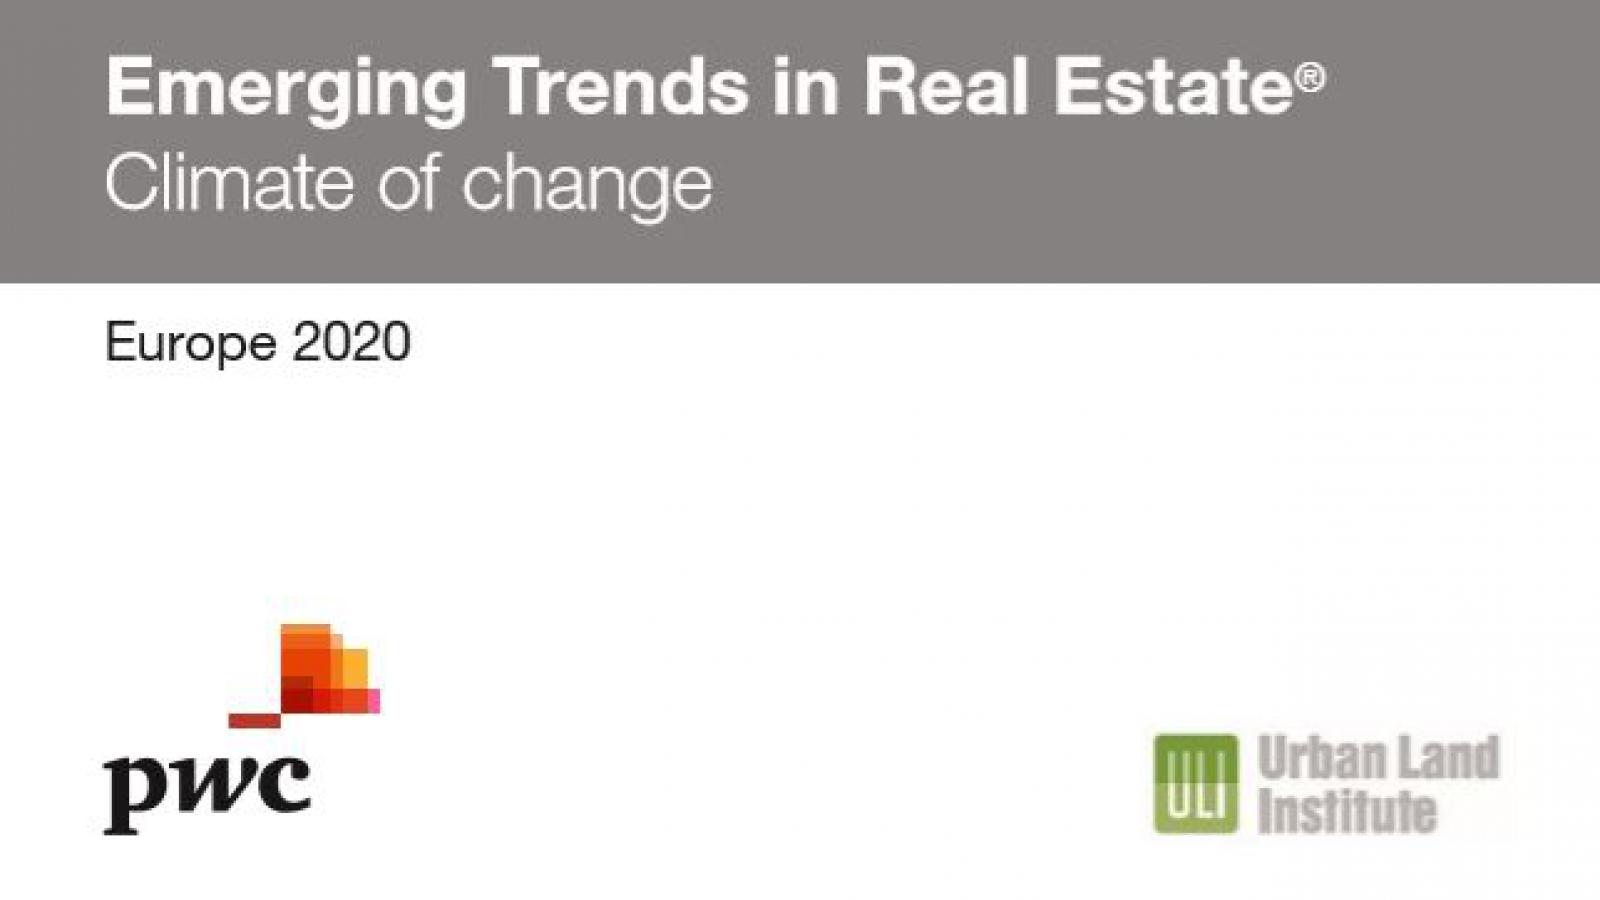 emerging trends Europe 2020 PwC ULI